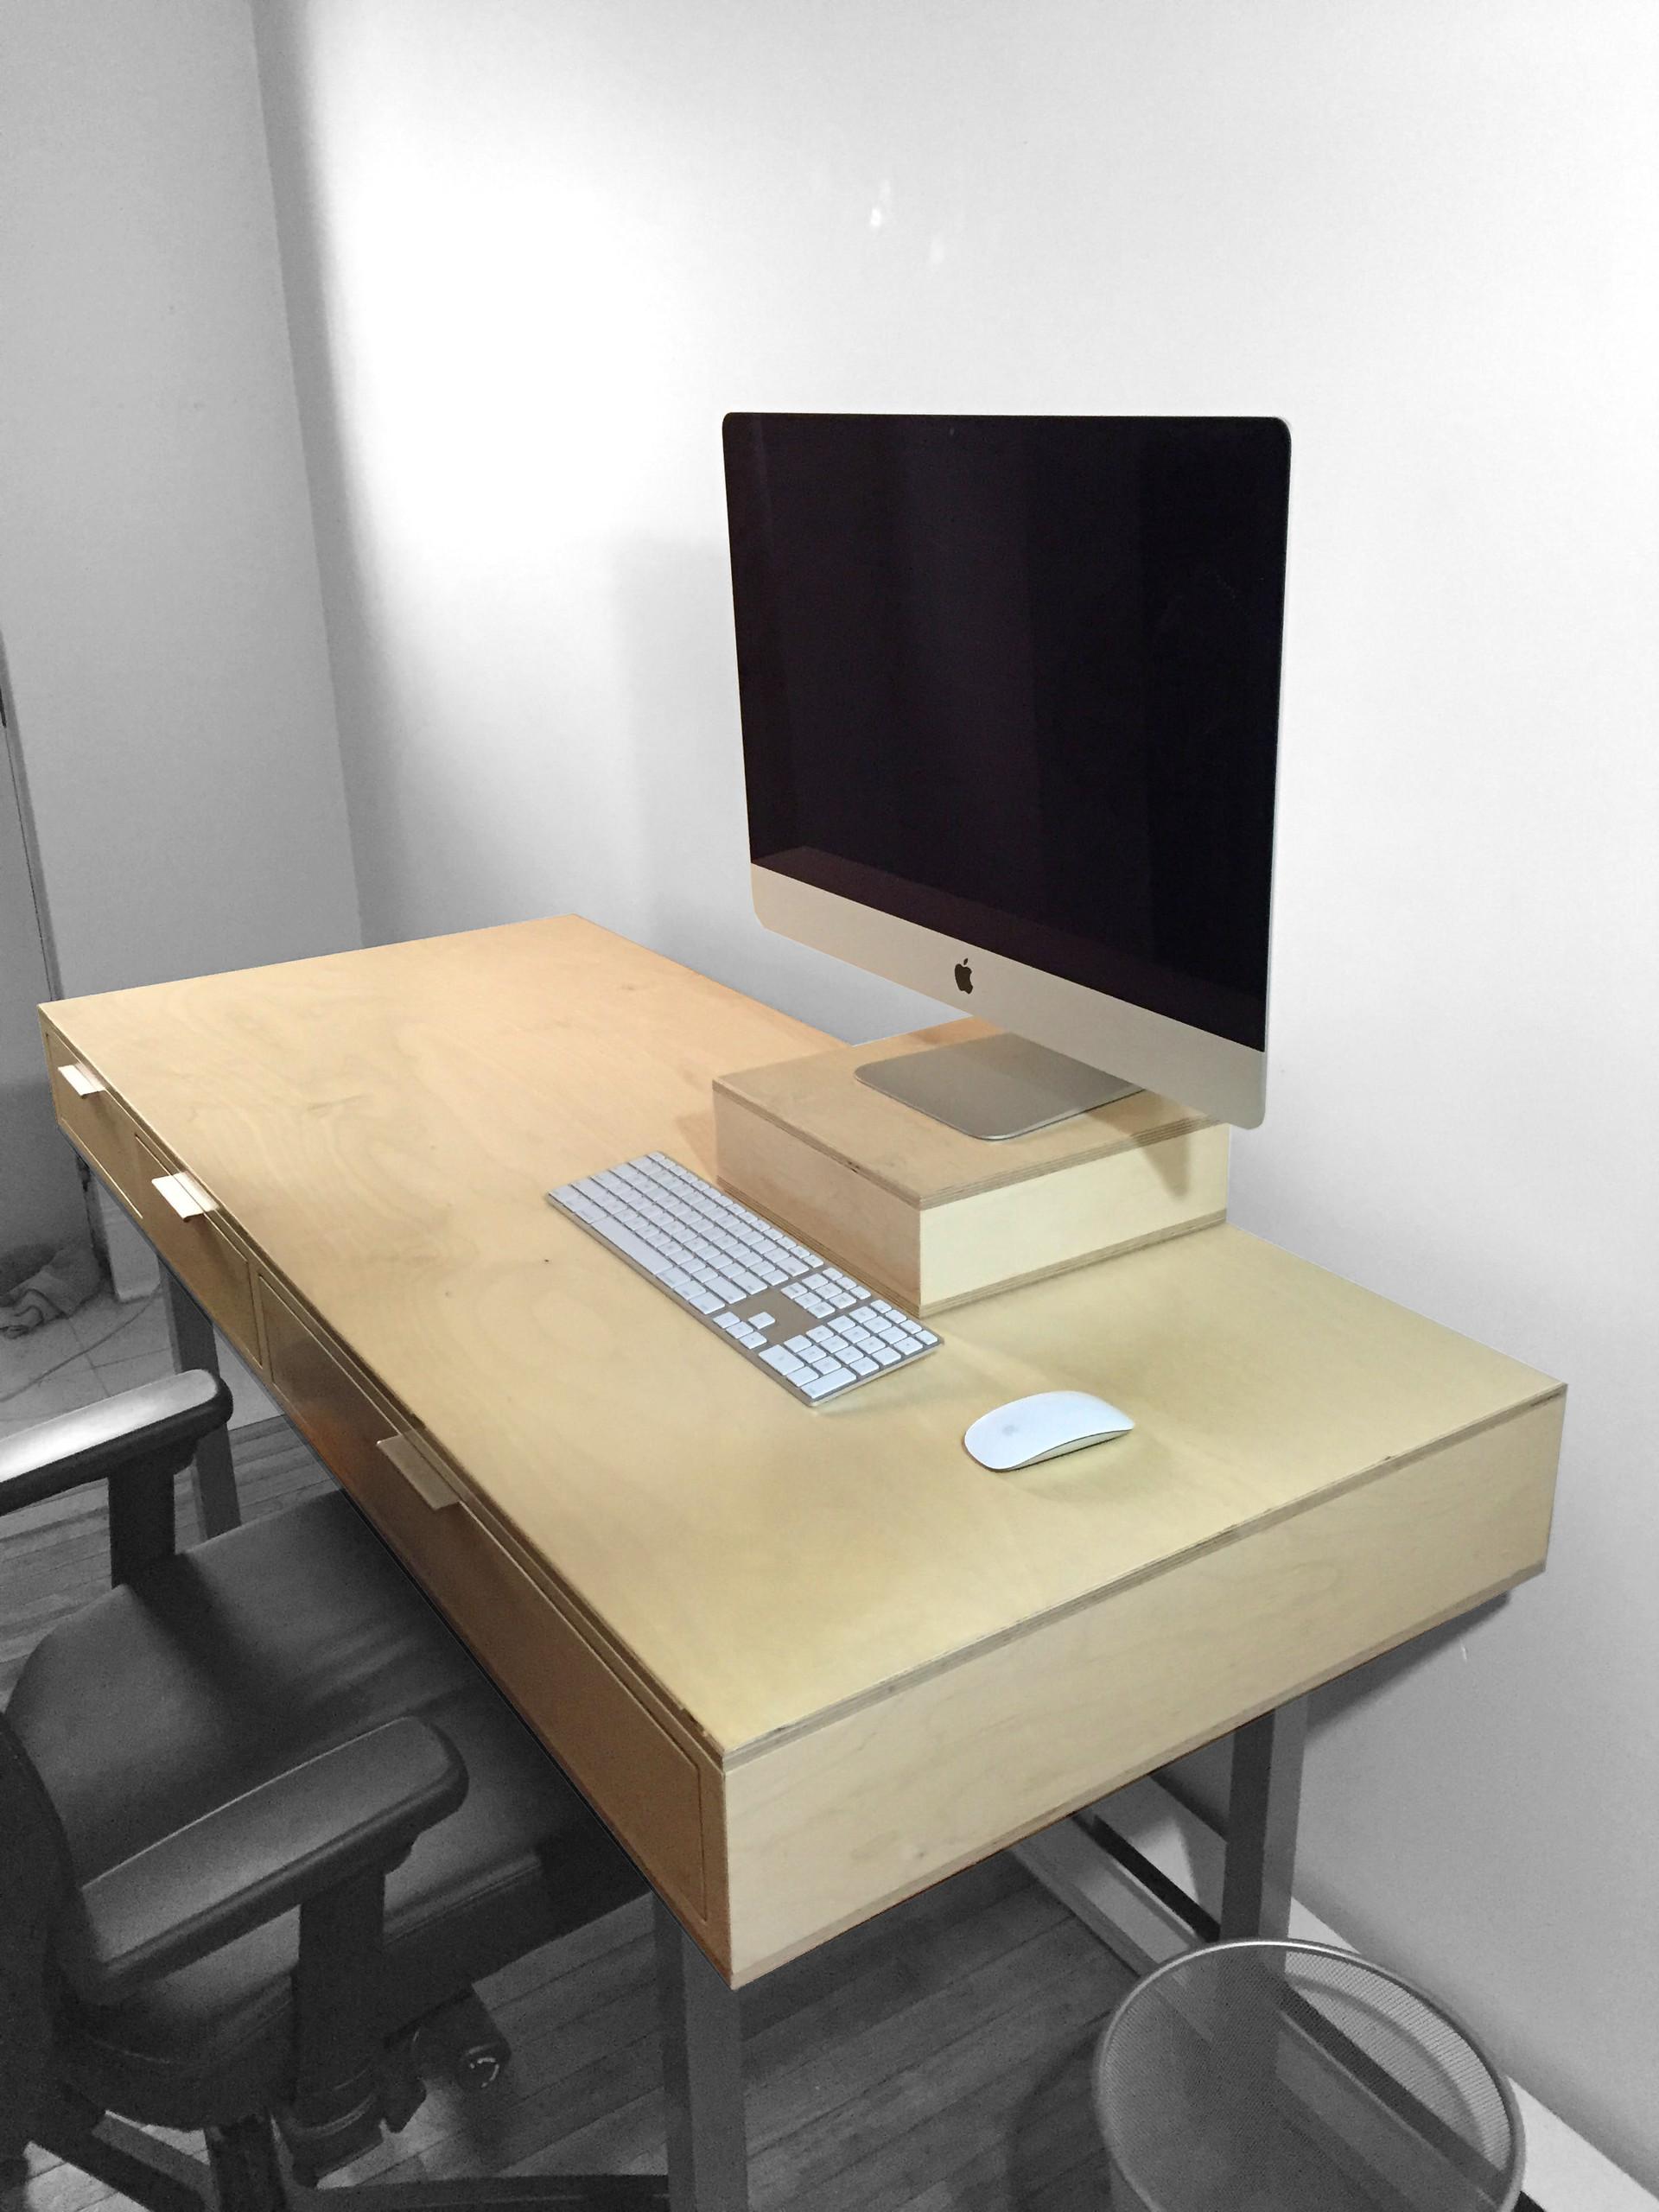 Desk_01 edit.jpg